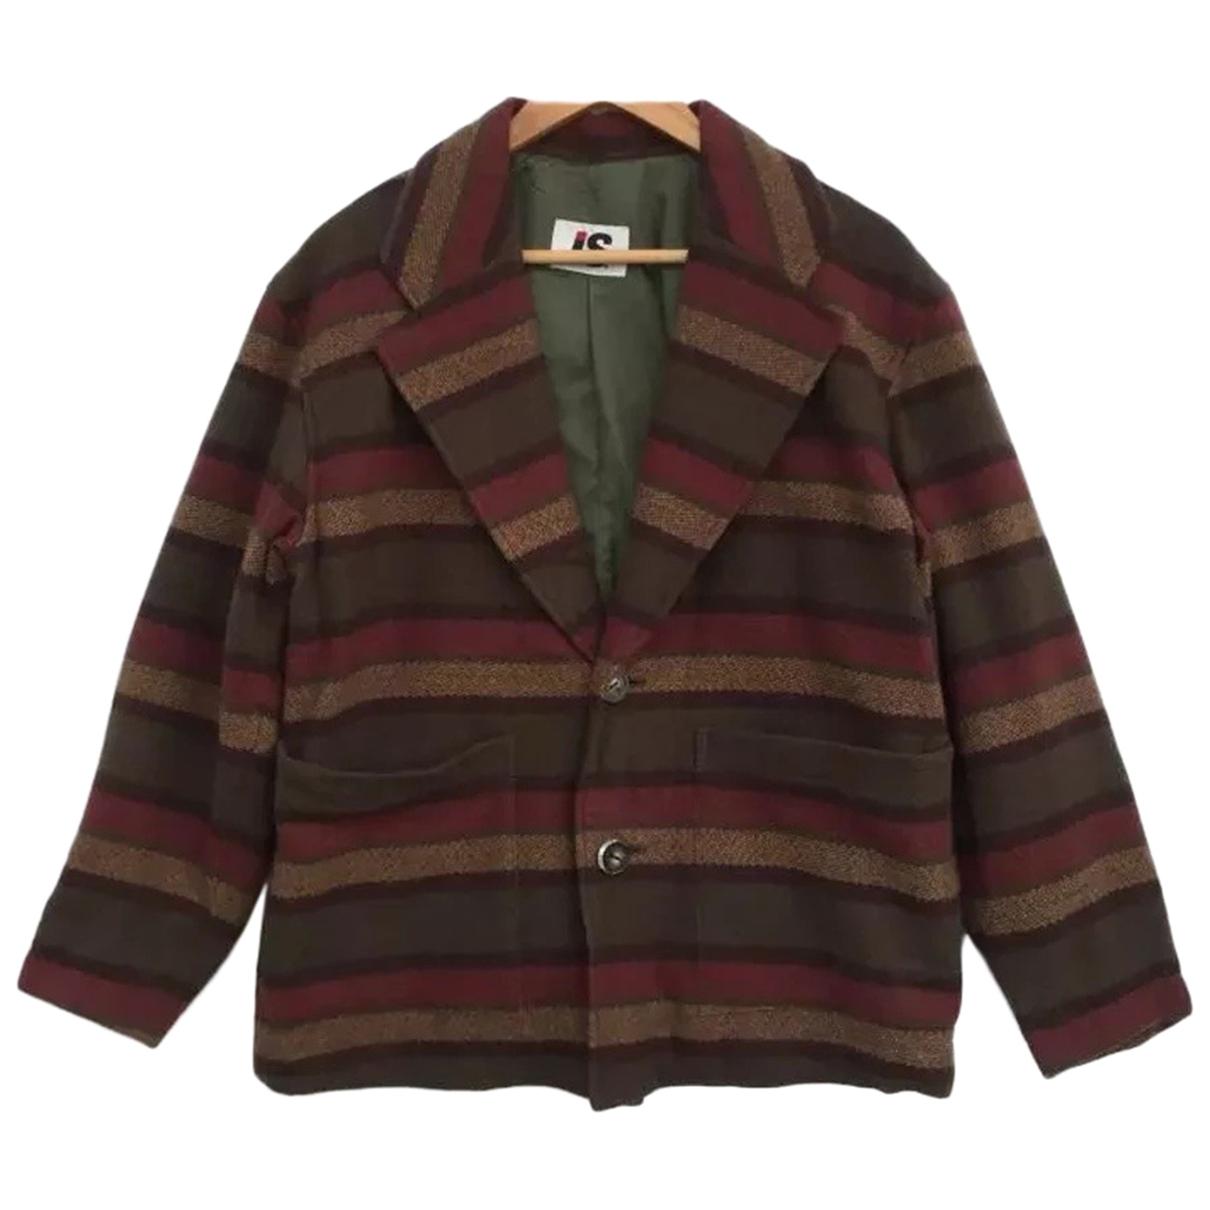 Issey Miyake \N Multicolour Wool jacket  for Men M International